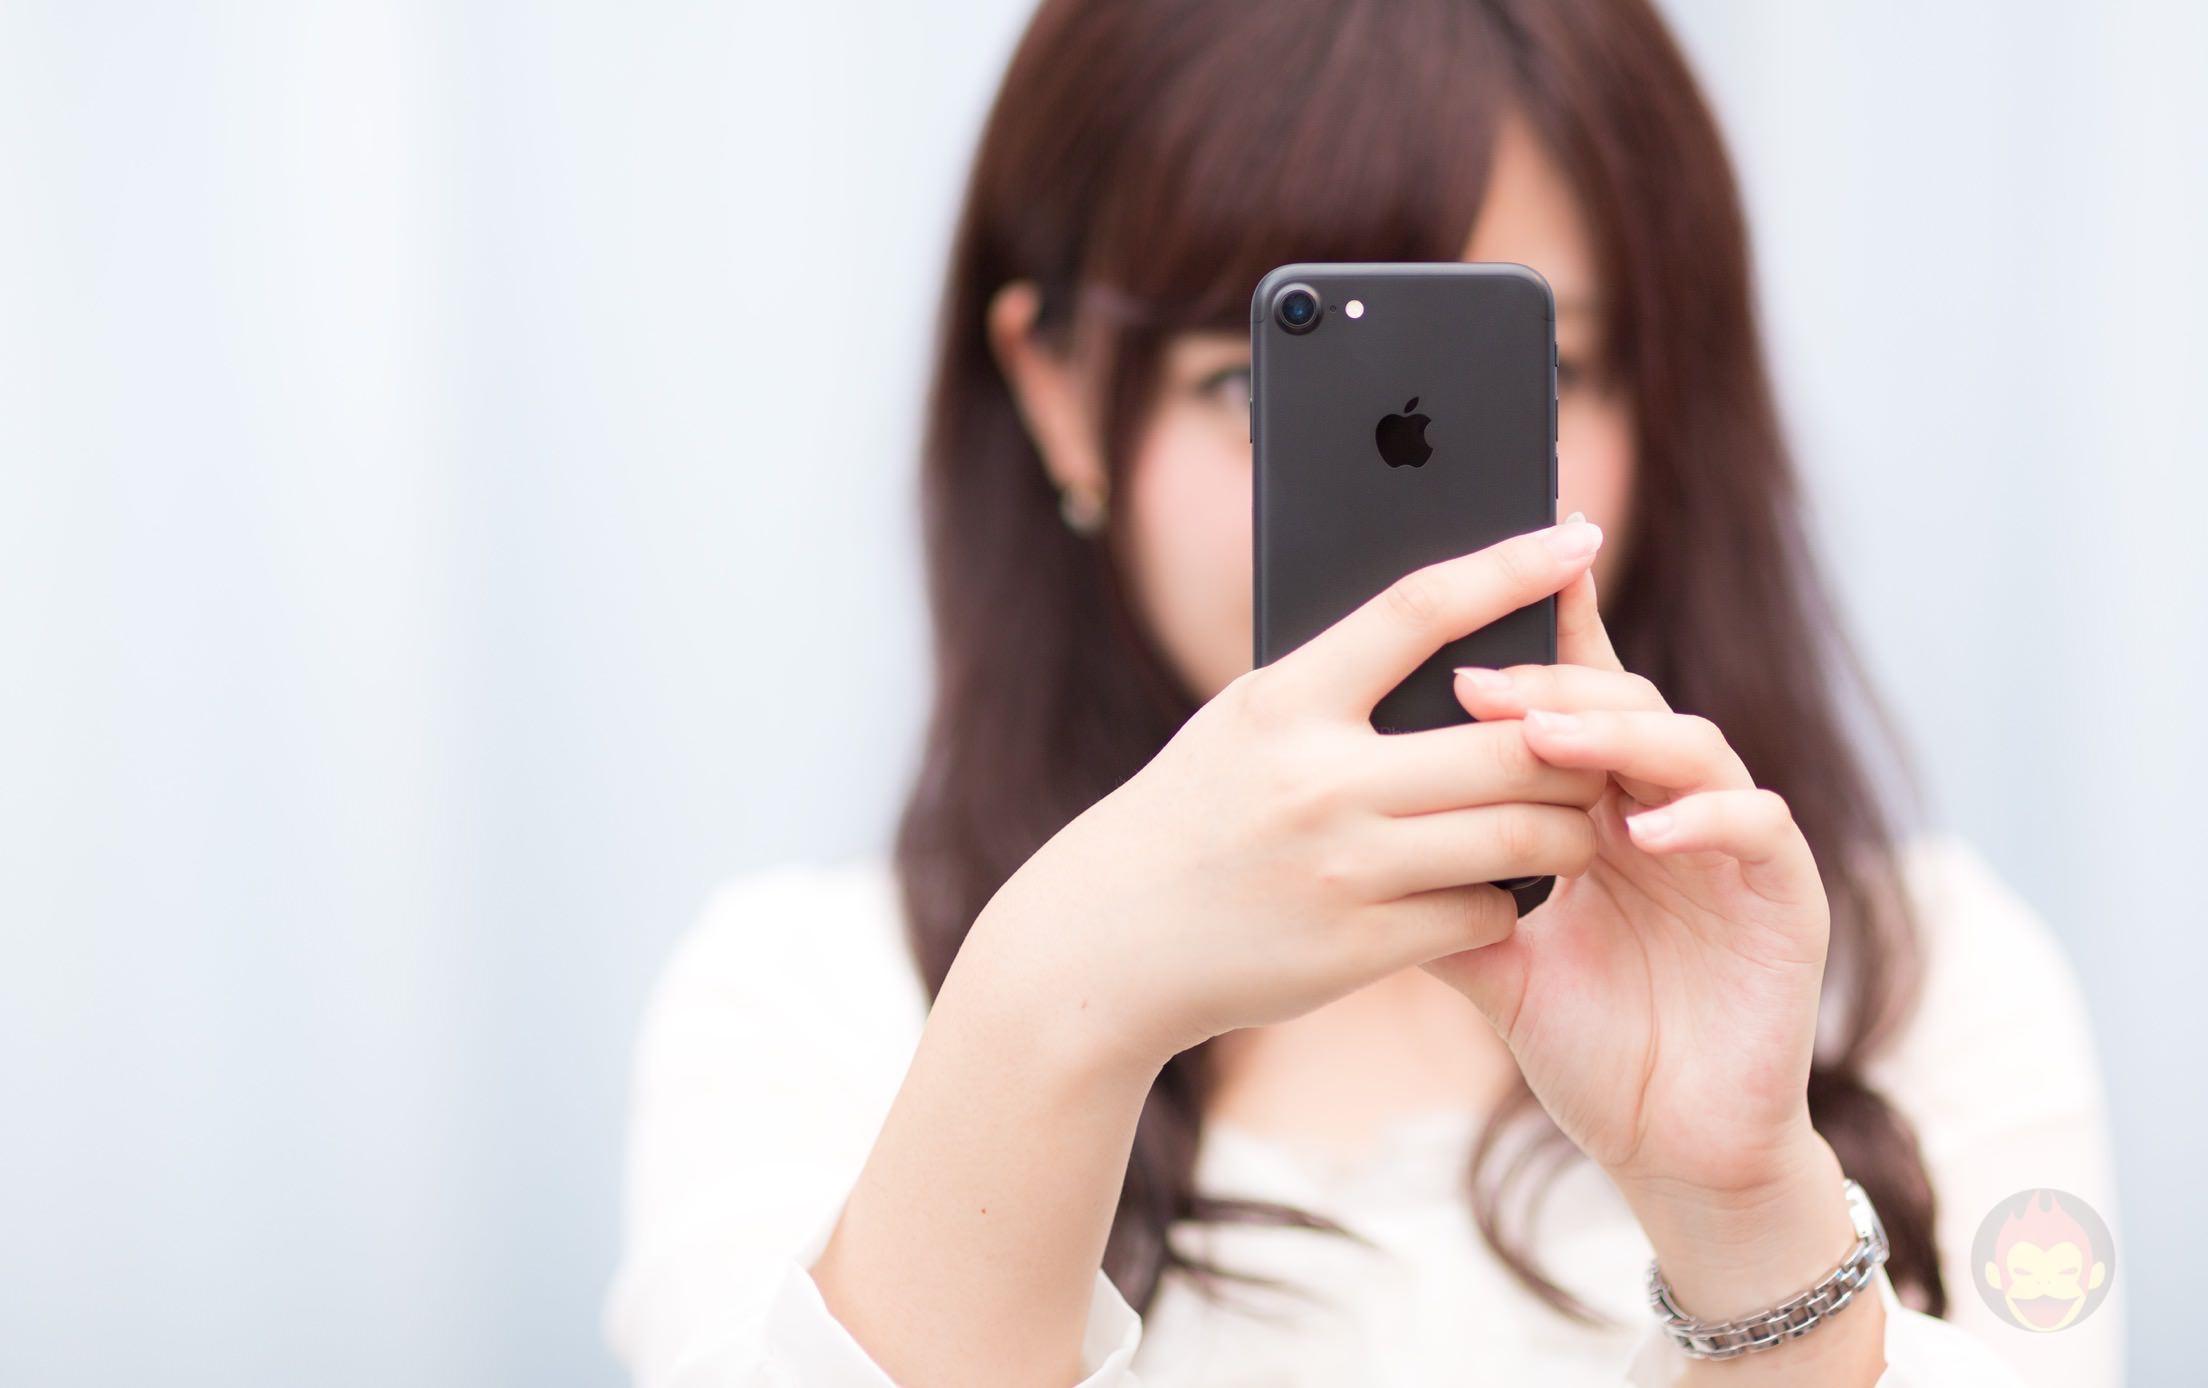 Yuka-Kawamura-iPhone7-Black-07.jpg